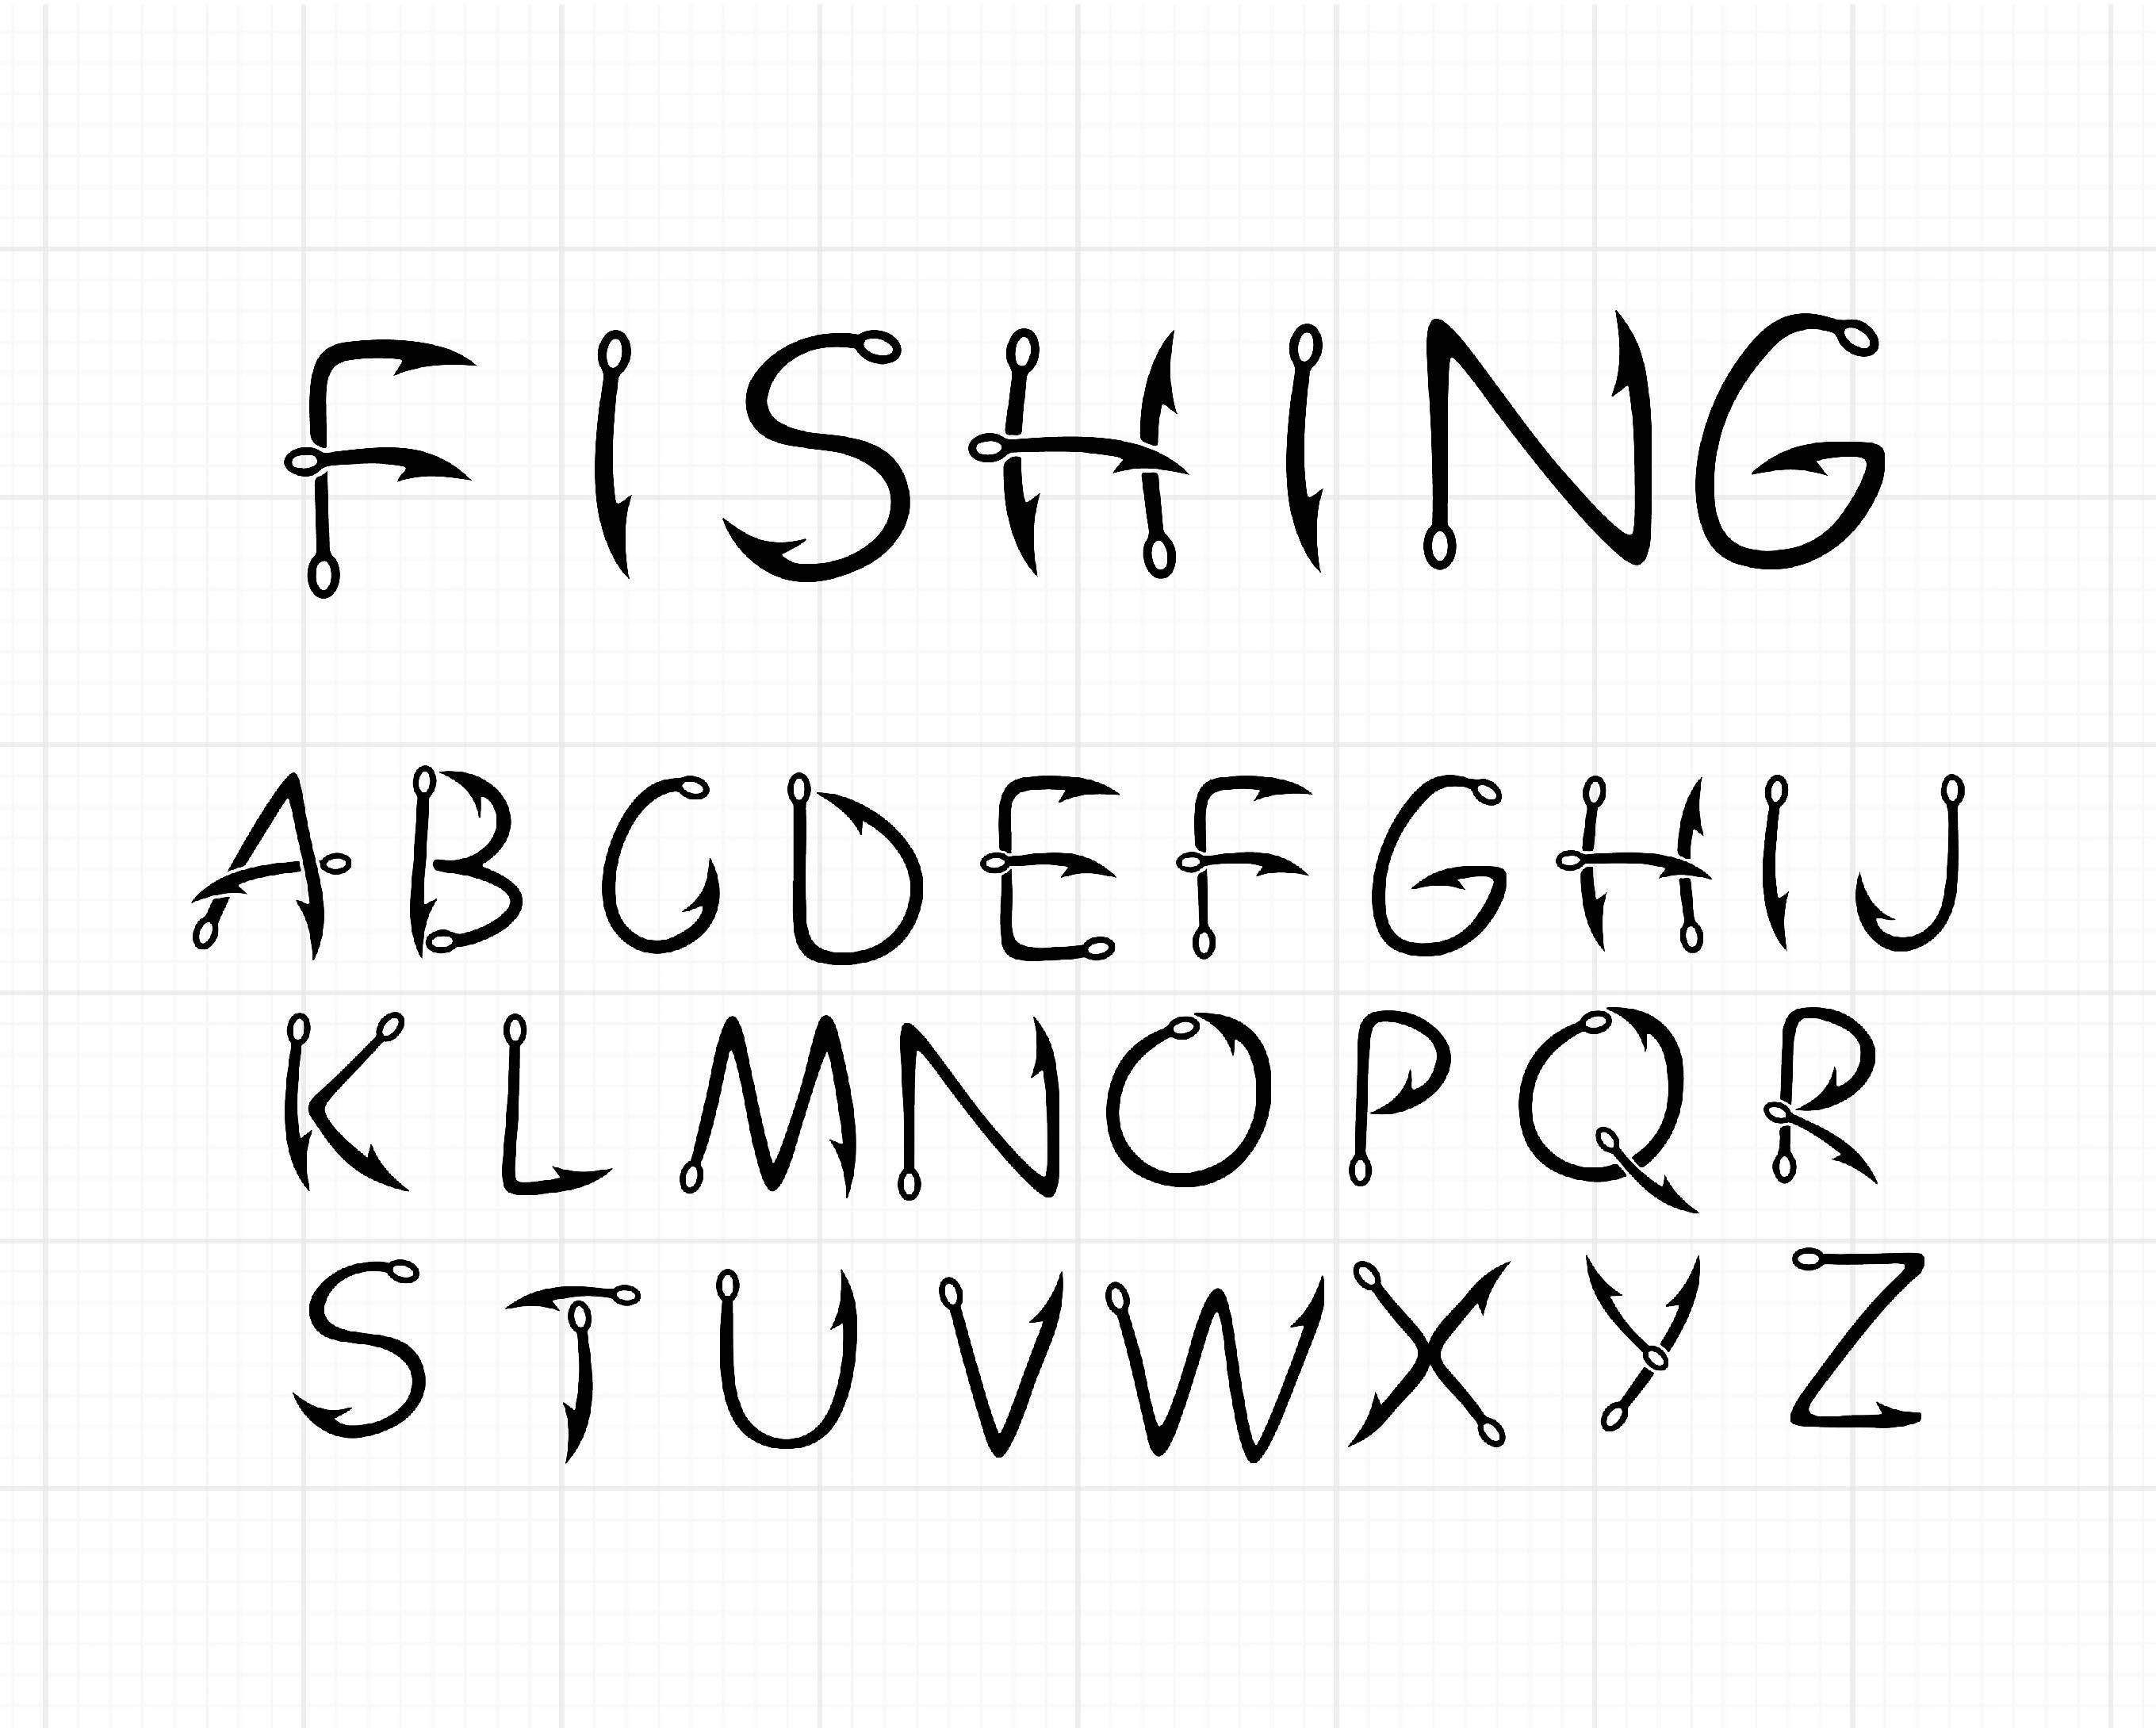 Download Fishing Letters Svg Hook Fishing Alphabet Fish Hook Fishing Svg Font Silhouette Clipart Cricut Craft Supplies Tools Paper Kromasol Com